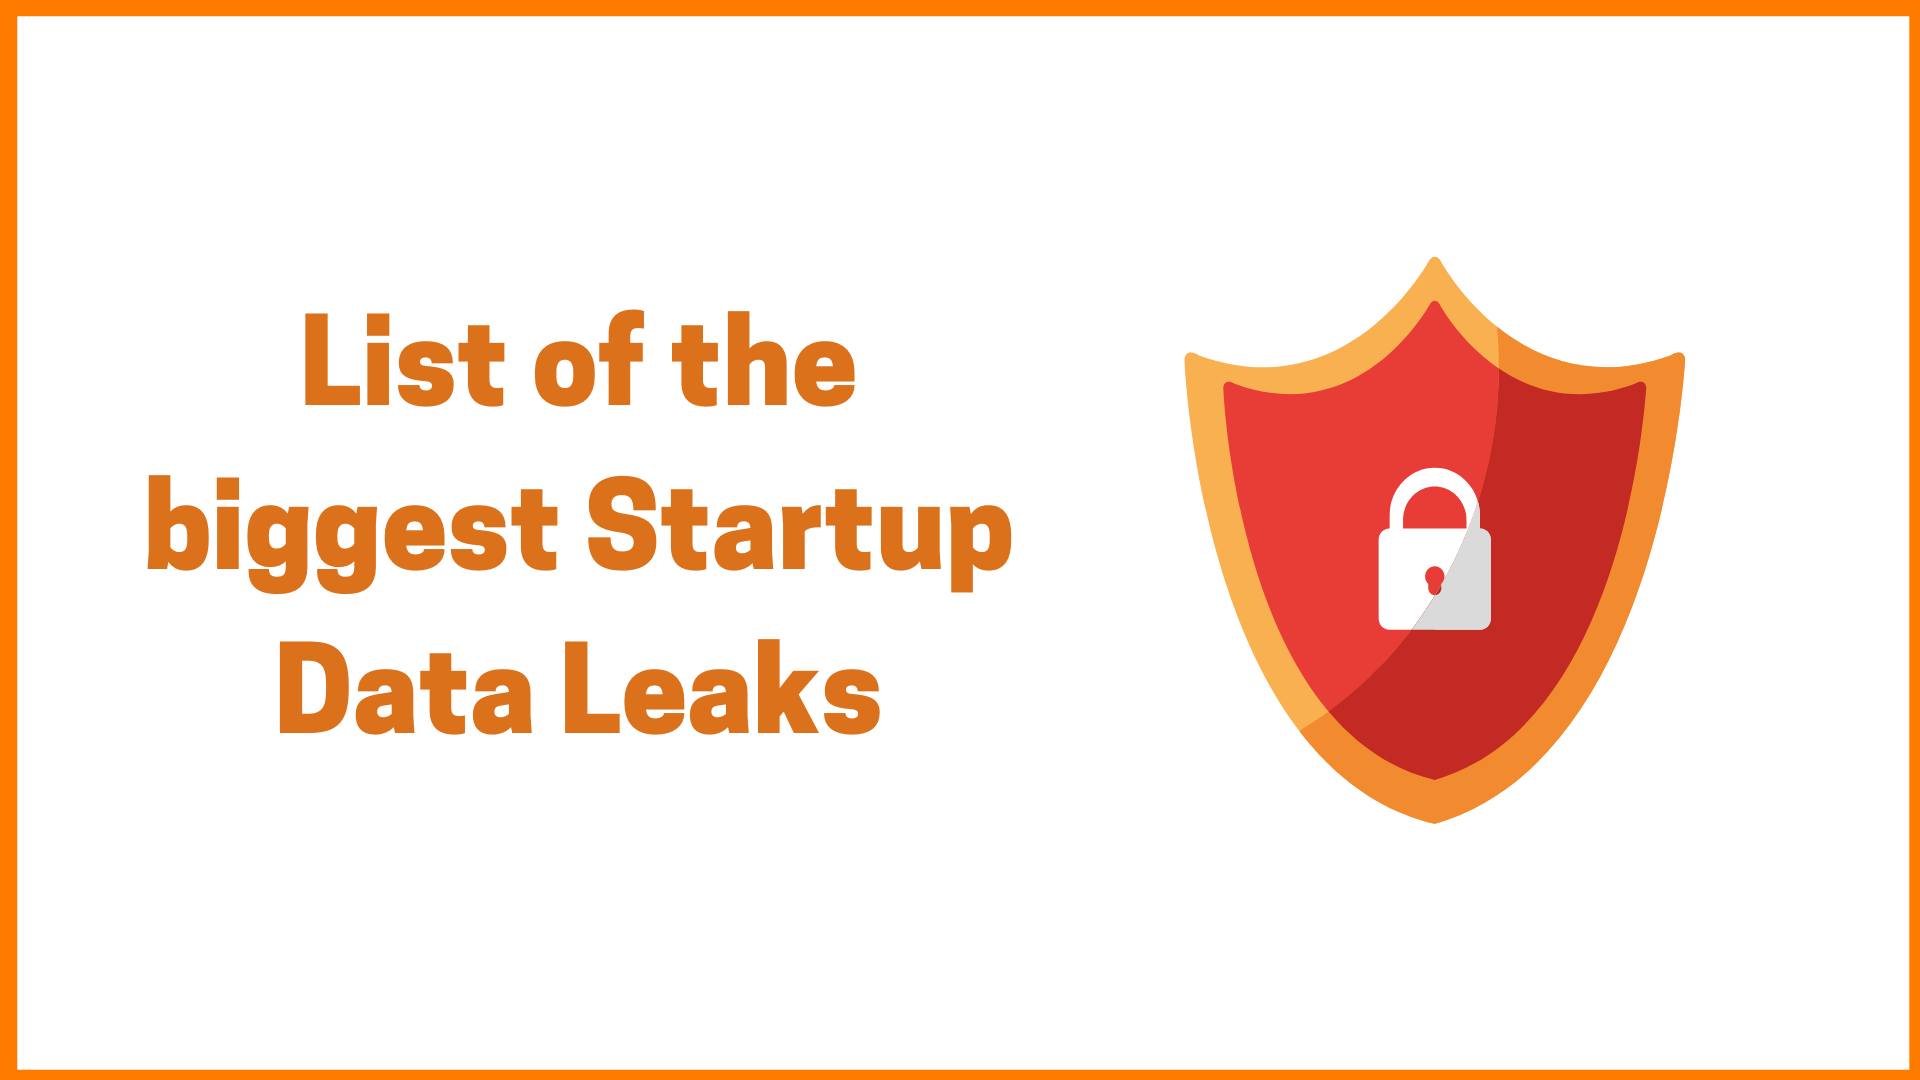 List of the biggest Startup Data Leaks